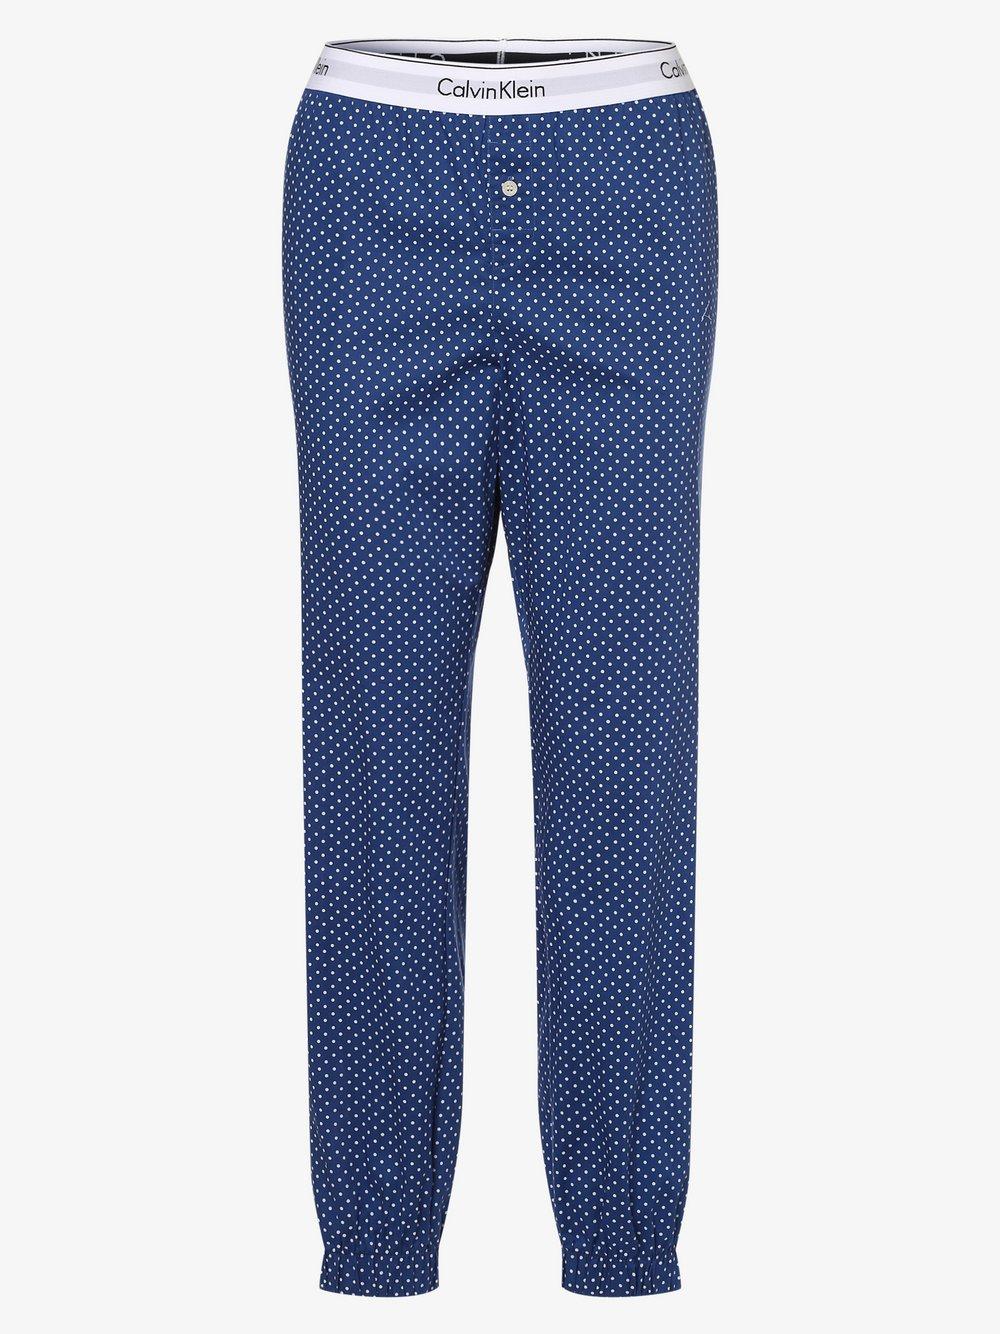 Calvin Klein - Damskie spodnie od piżamy, niebieski